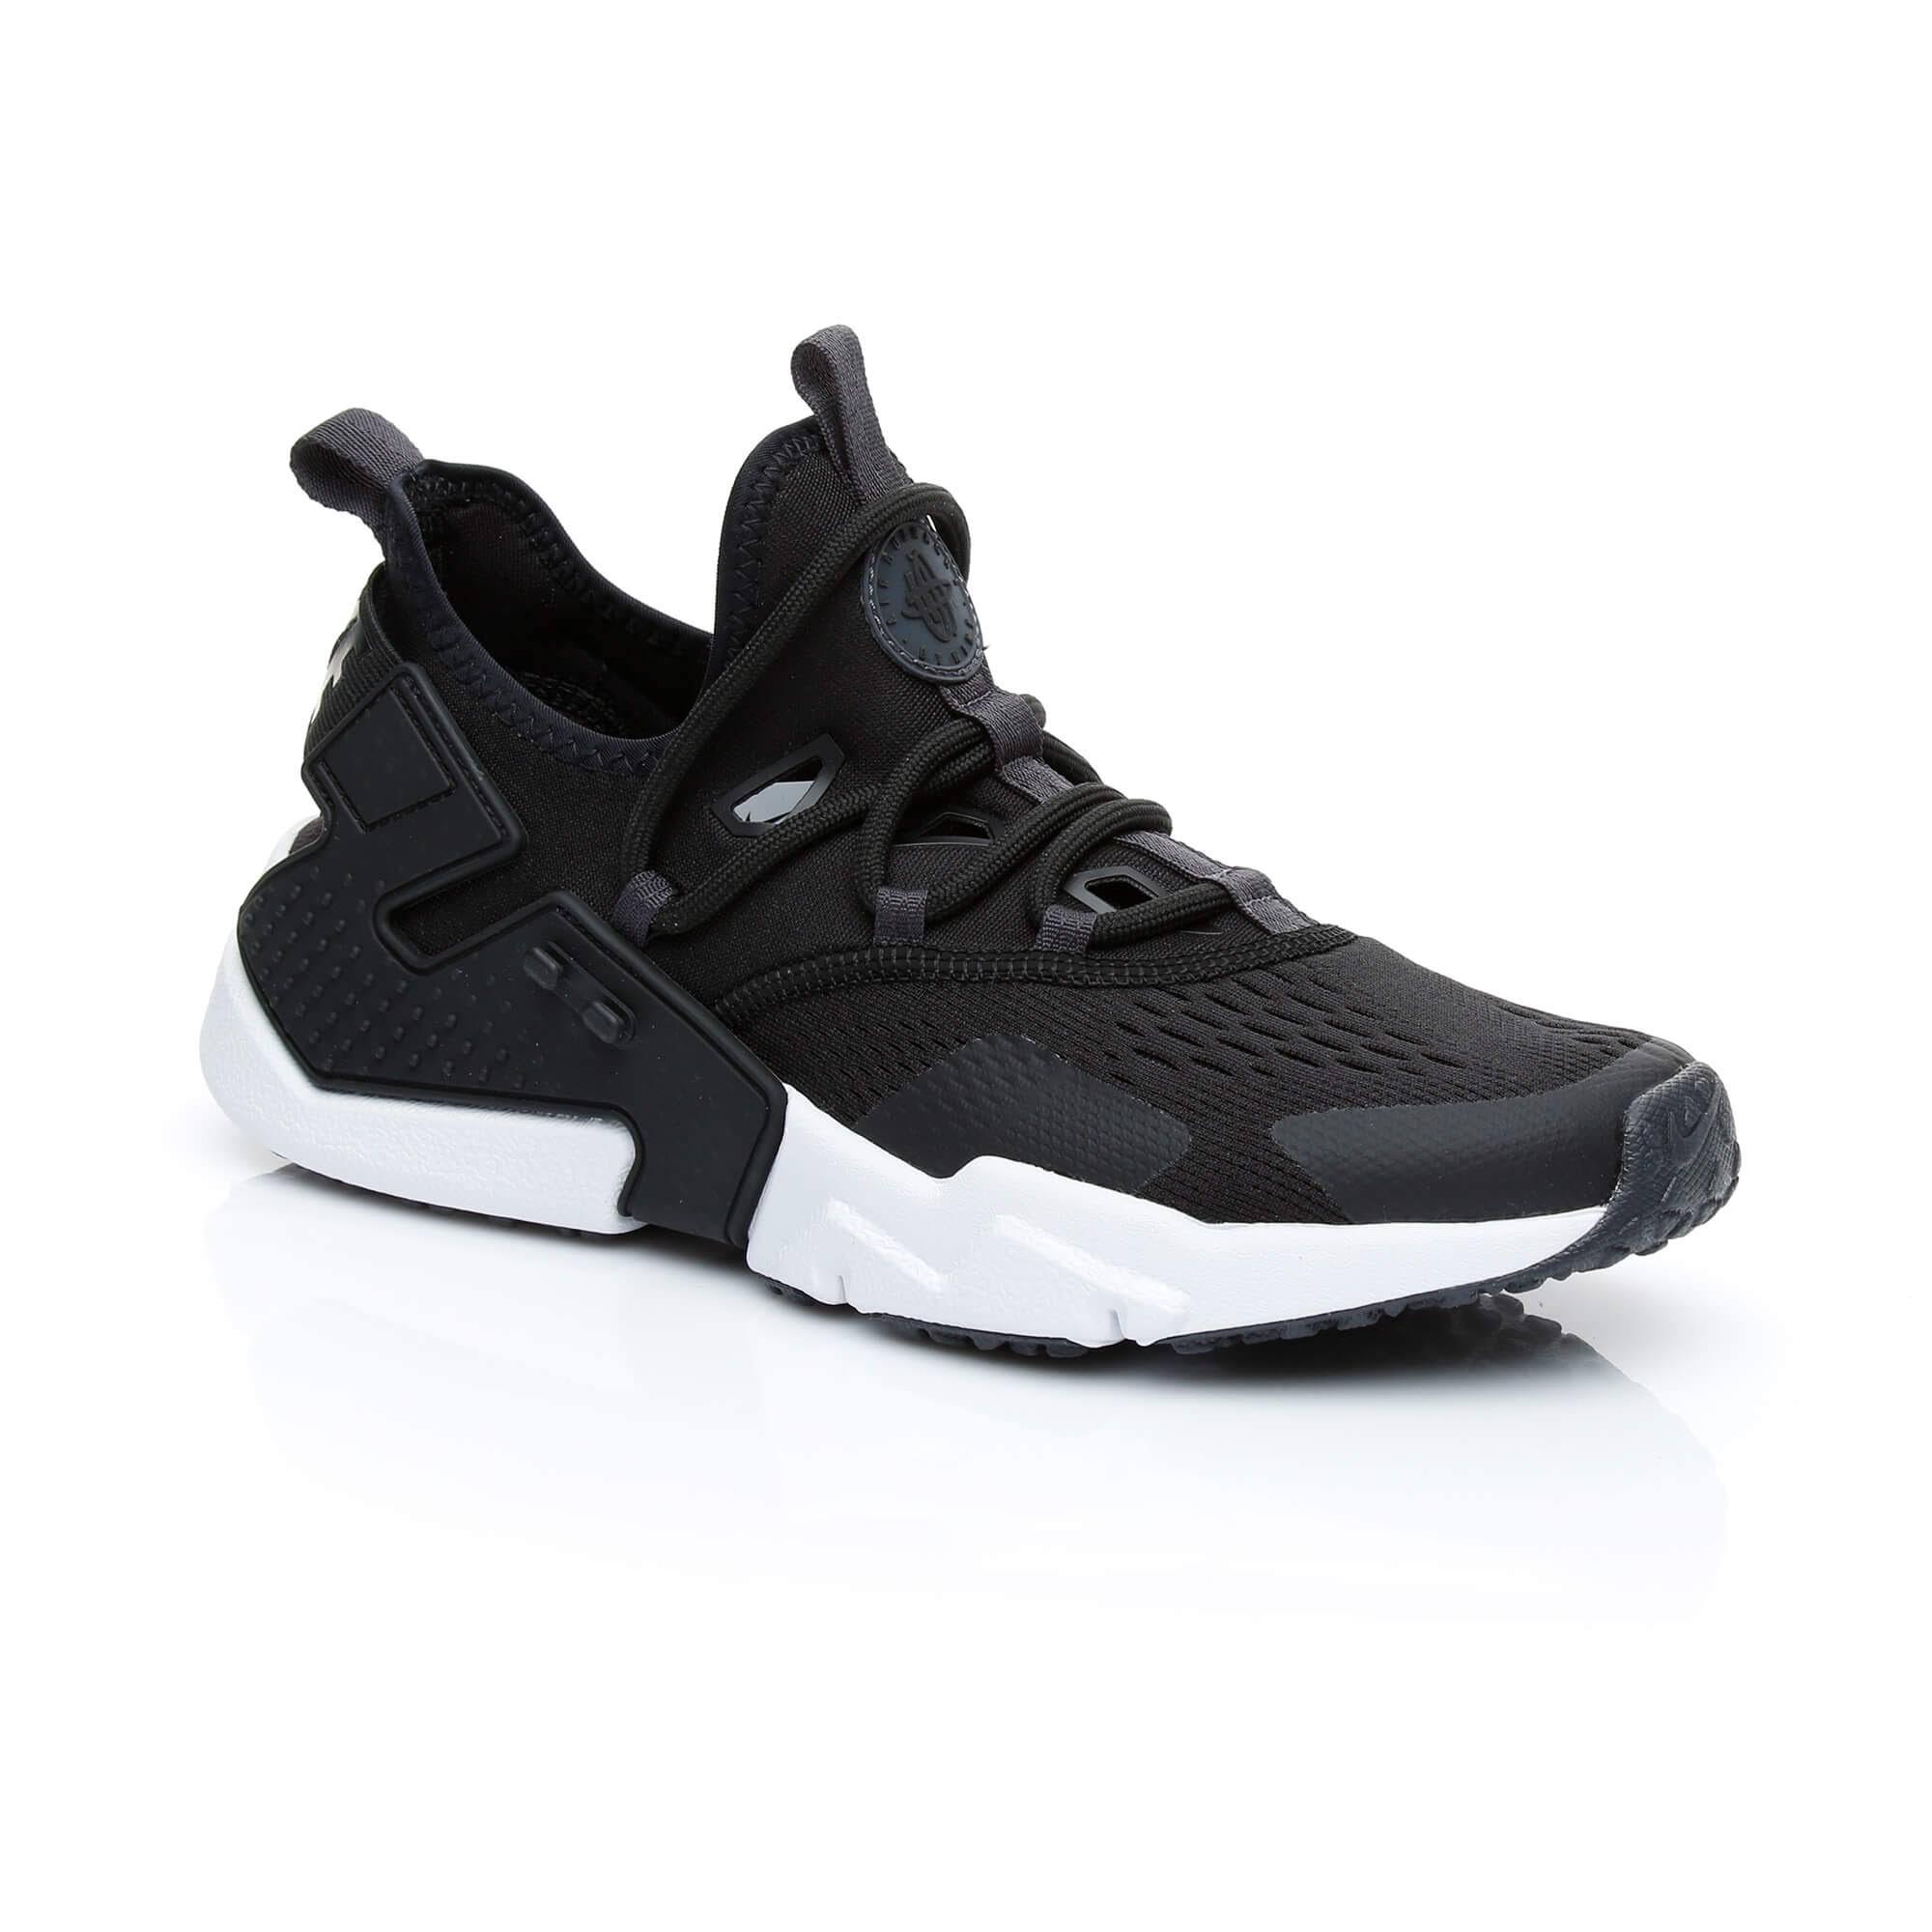 002 Air 5 Erkek Ao1133 Ayakkabı Drift Siyah Br Nike Günlük Huarache 44 t86qxcZw